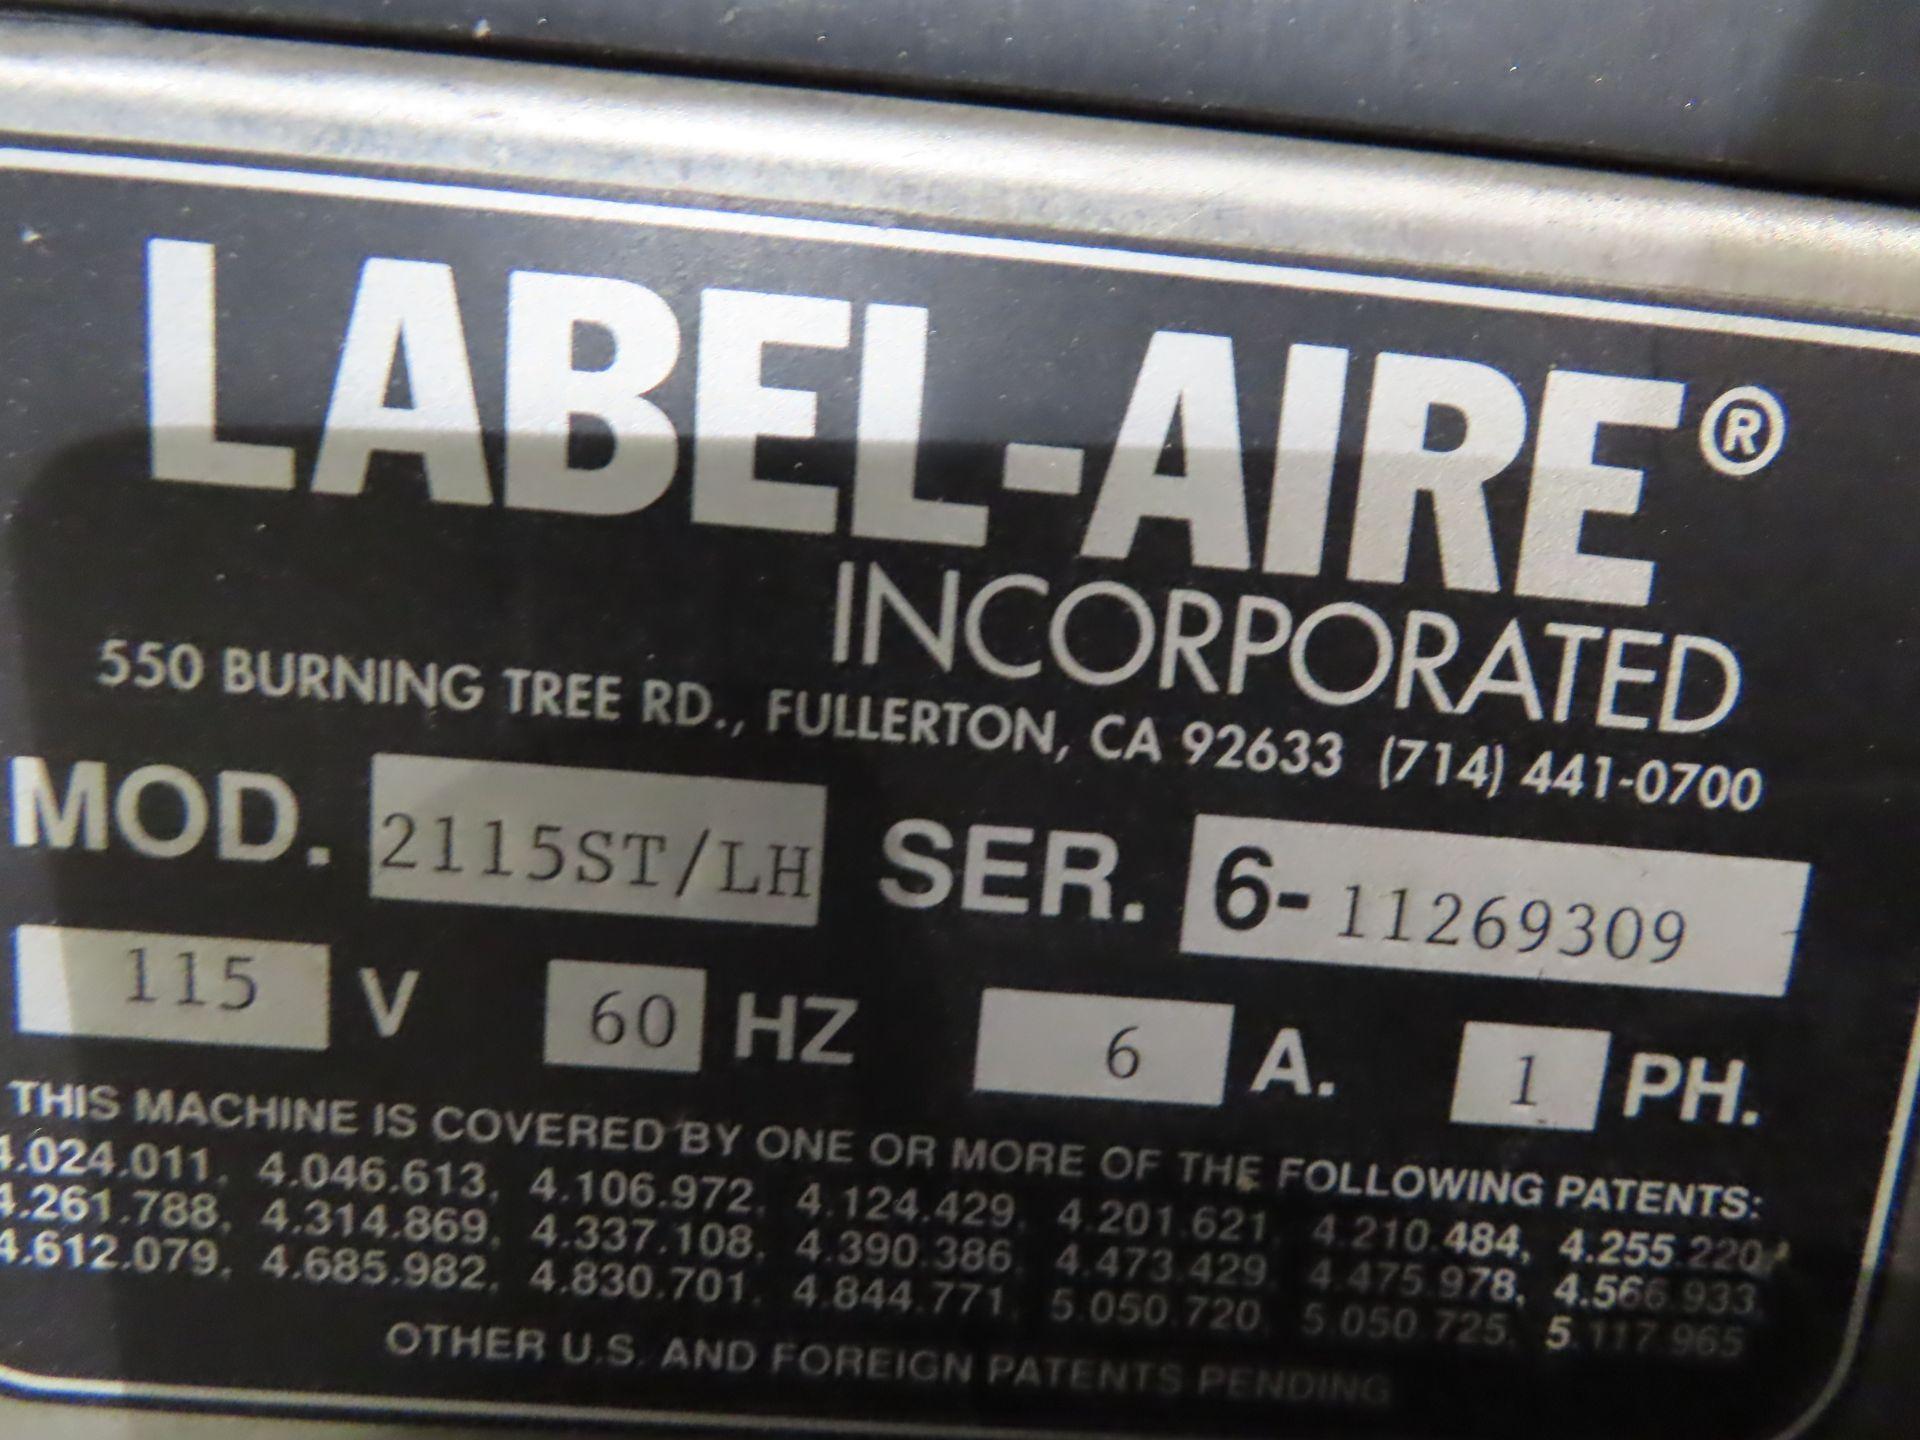 Lot 134 - Label Applicator